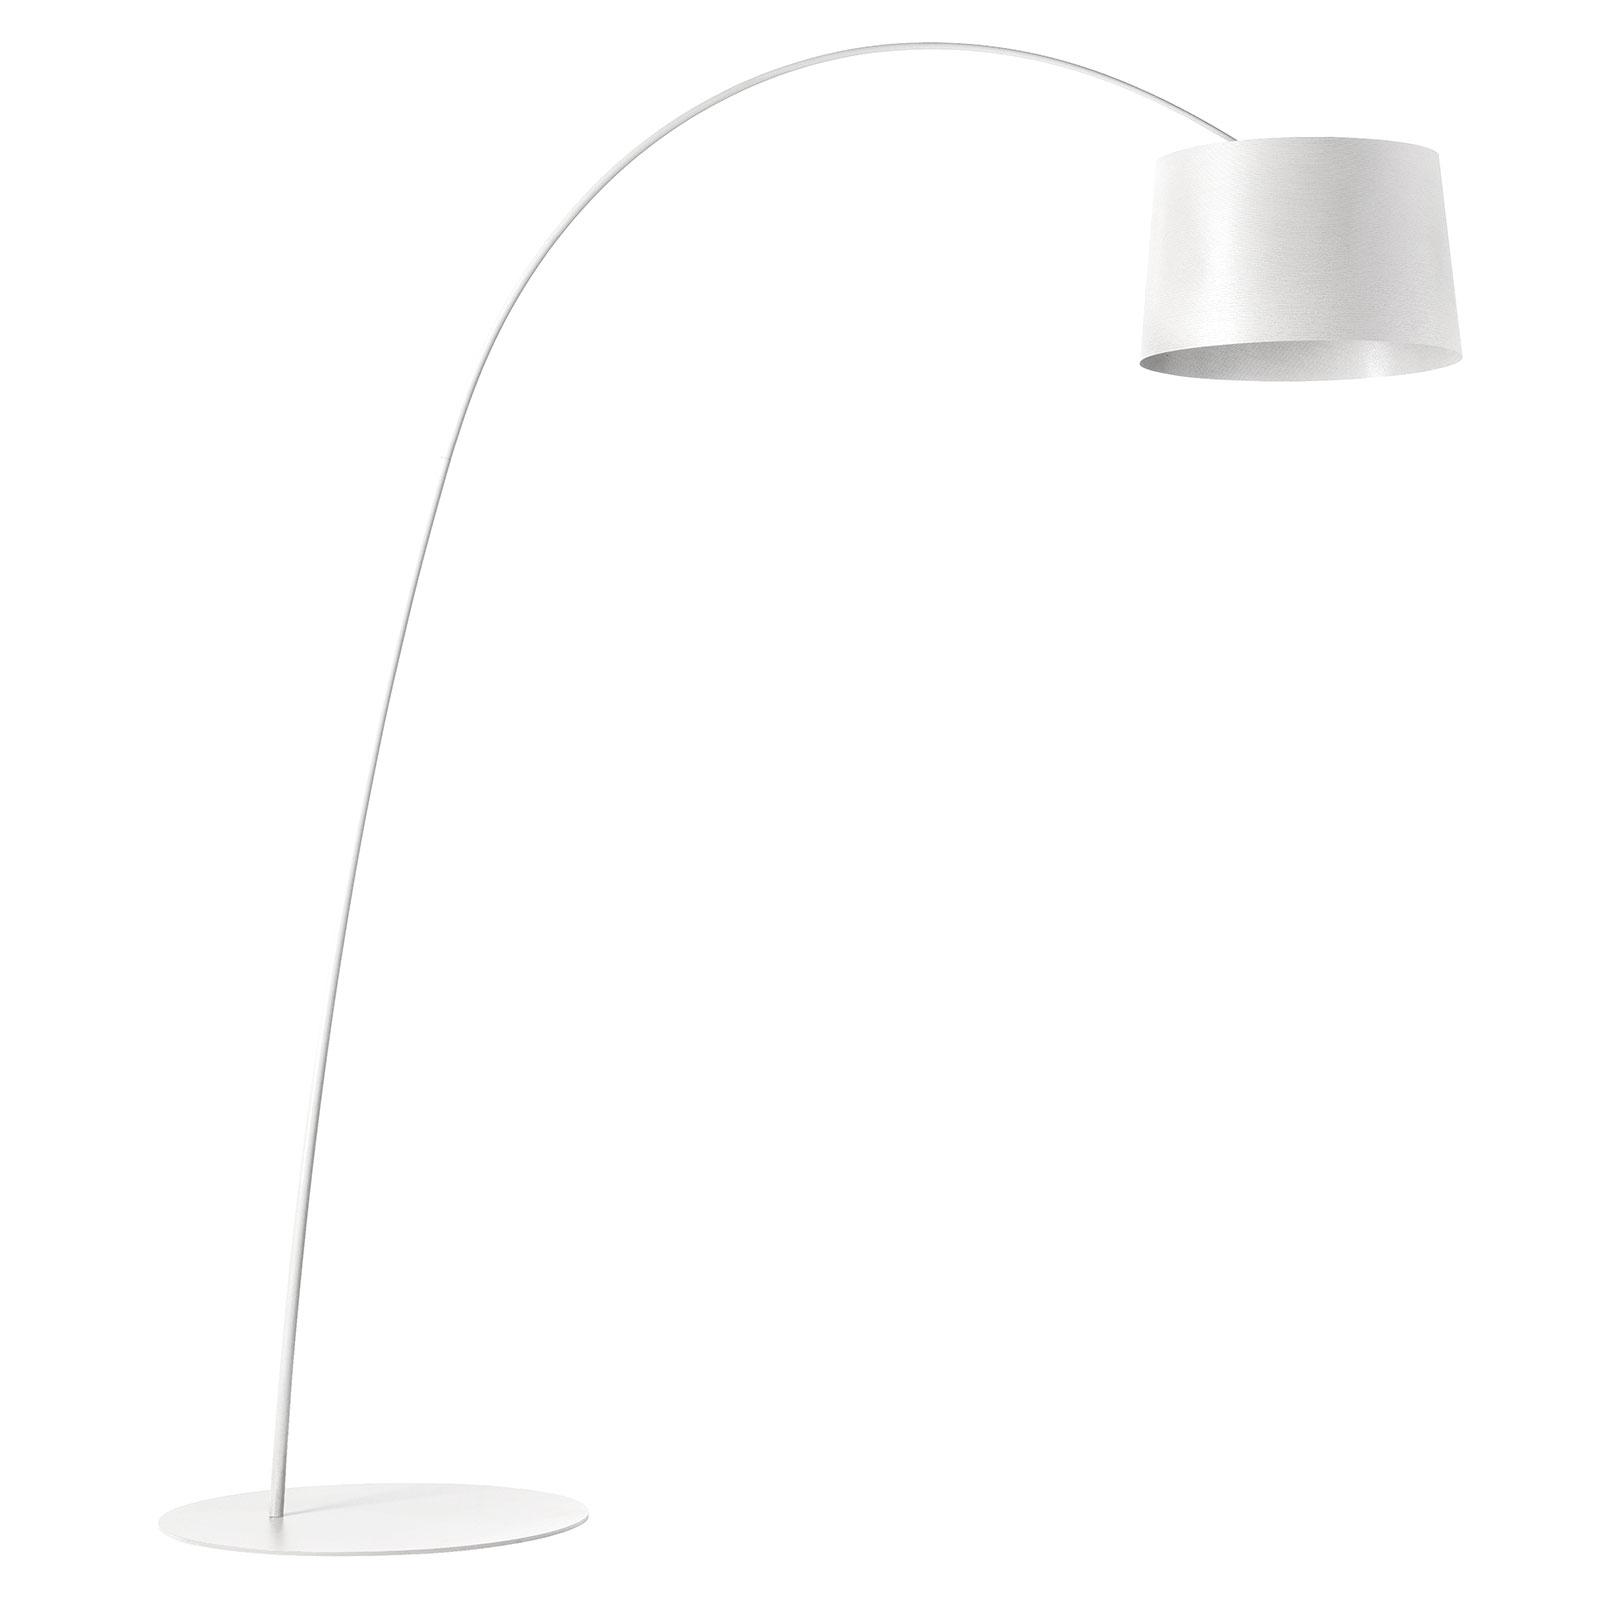 Foscarini Twiggy LED-båglampa, vit